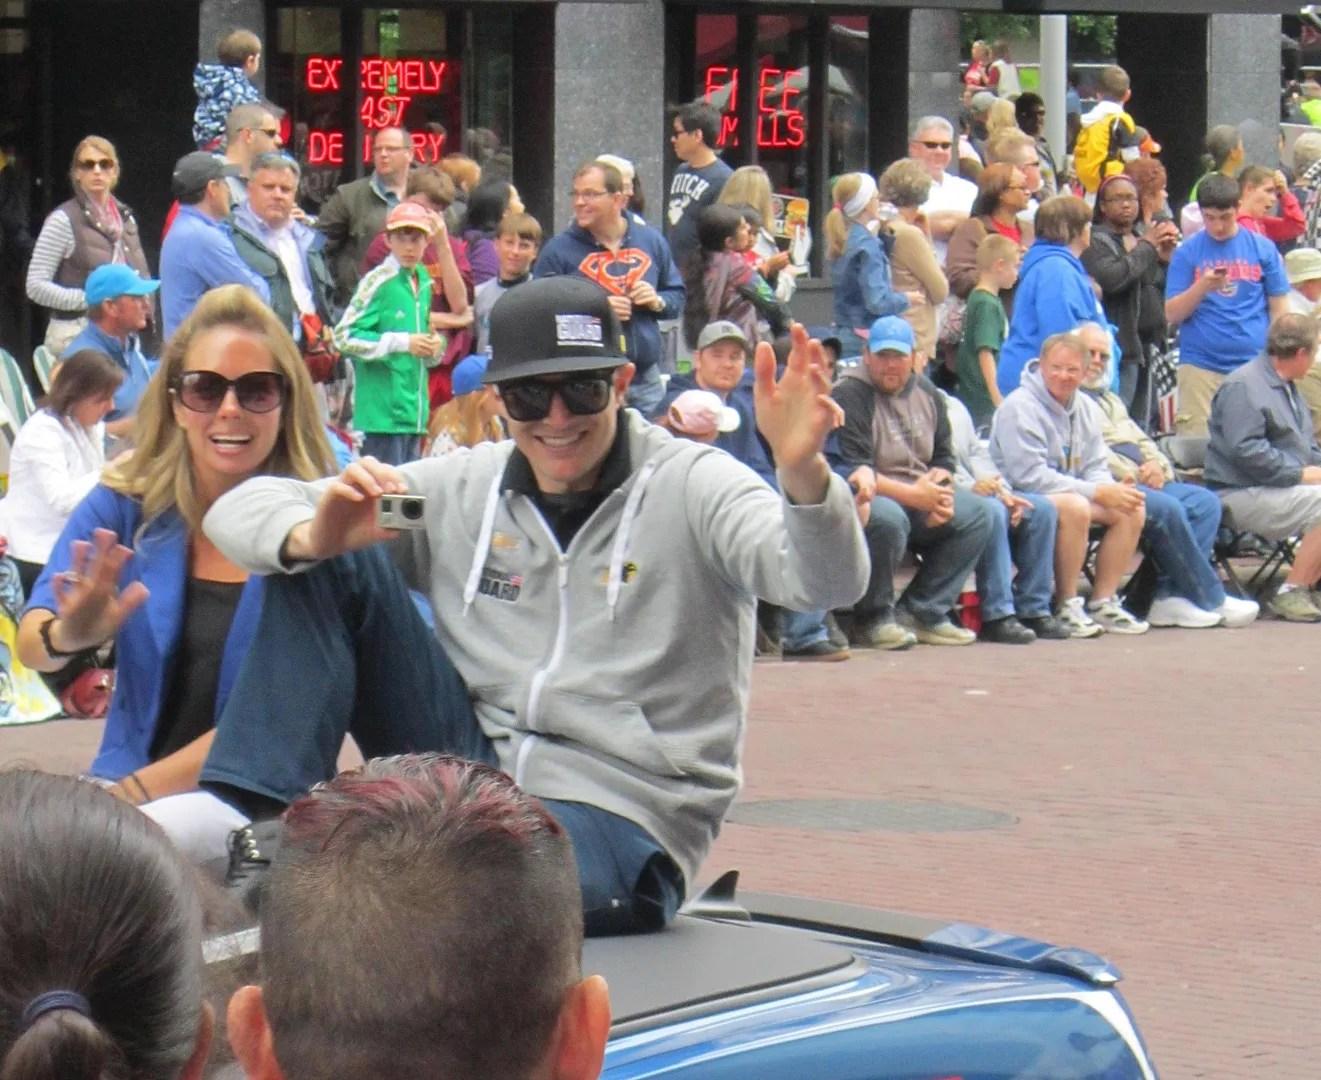 JR Hildebrand, Indianapolis, 500, 500 Festival Parade, Indianapolis, 2013